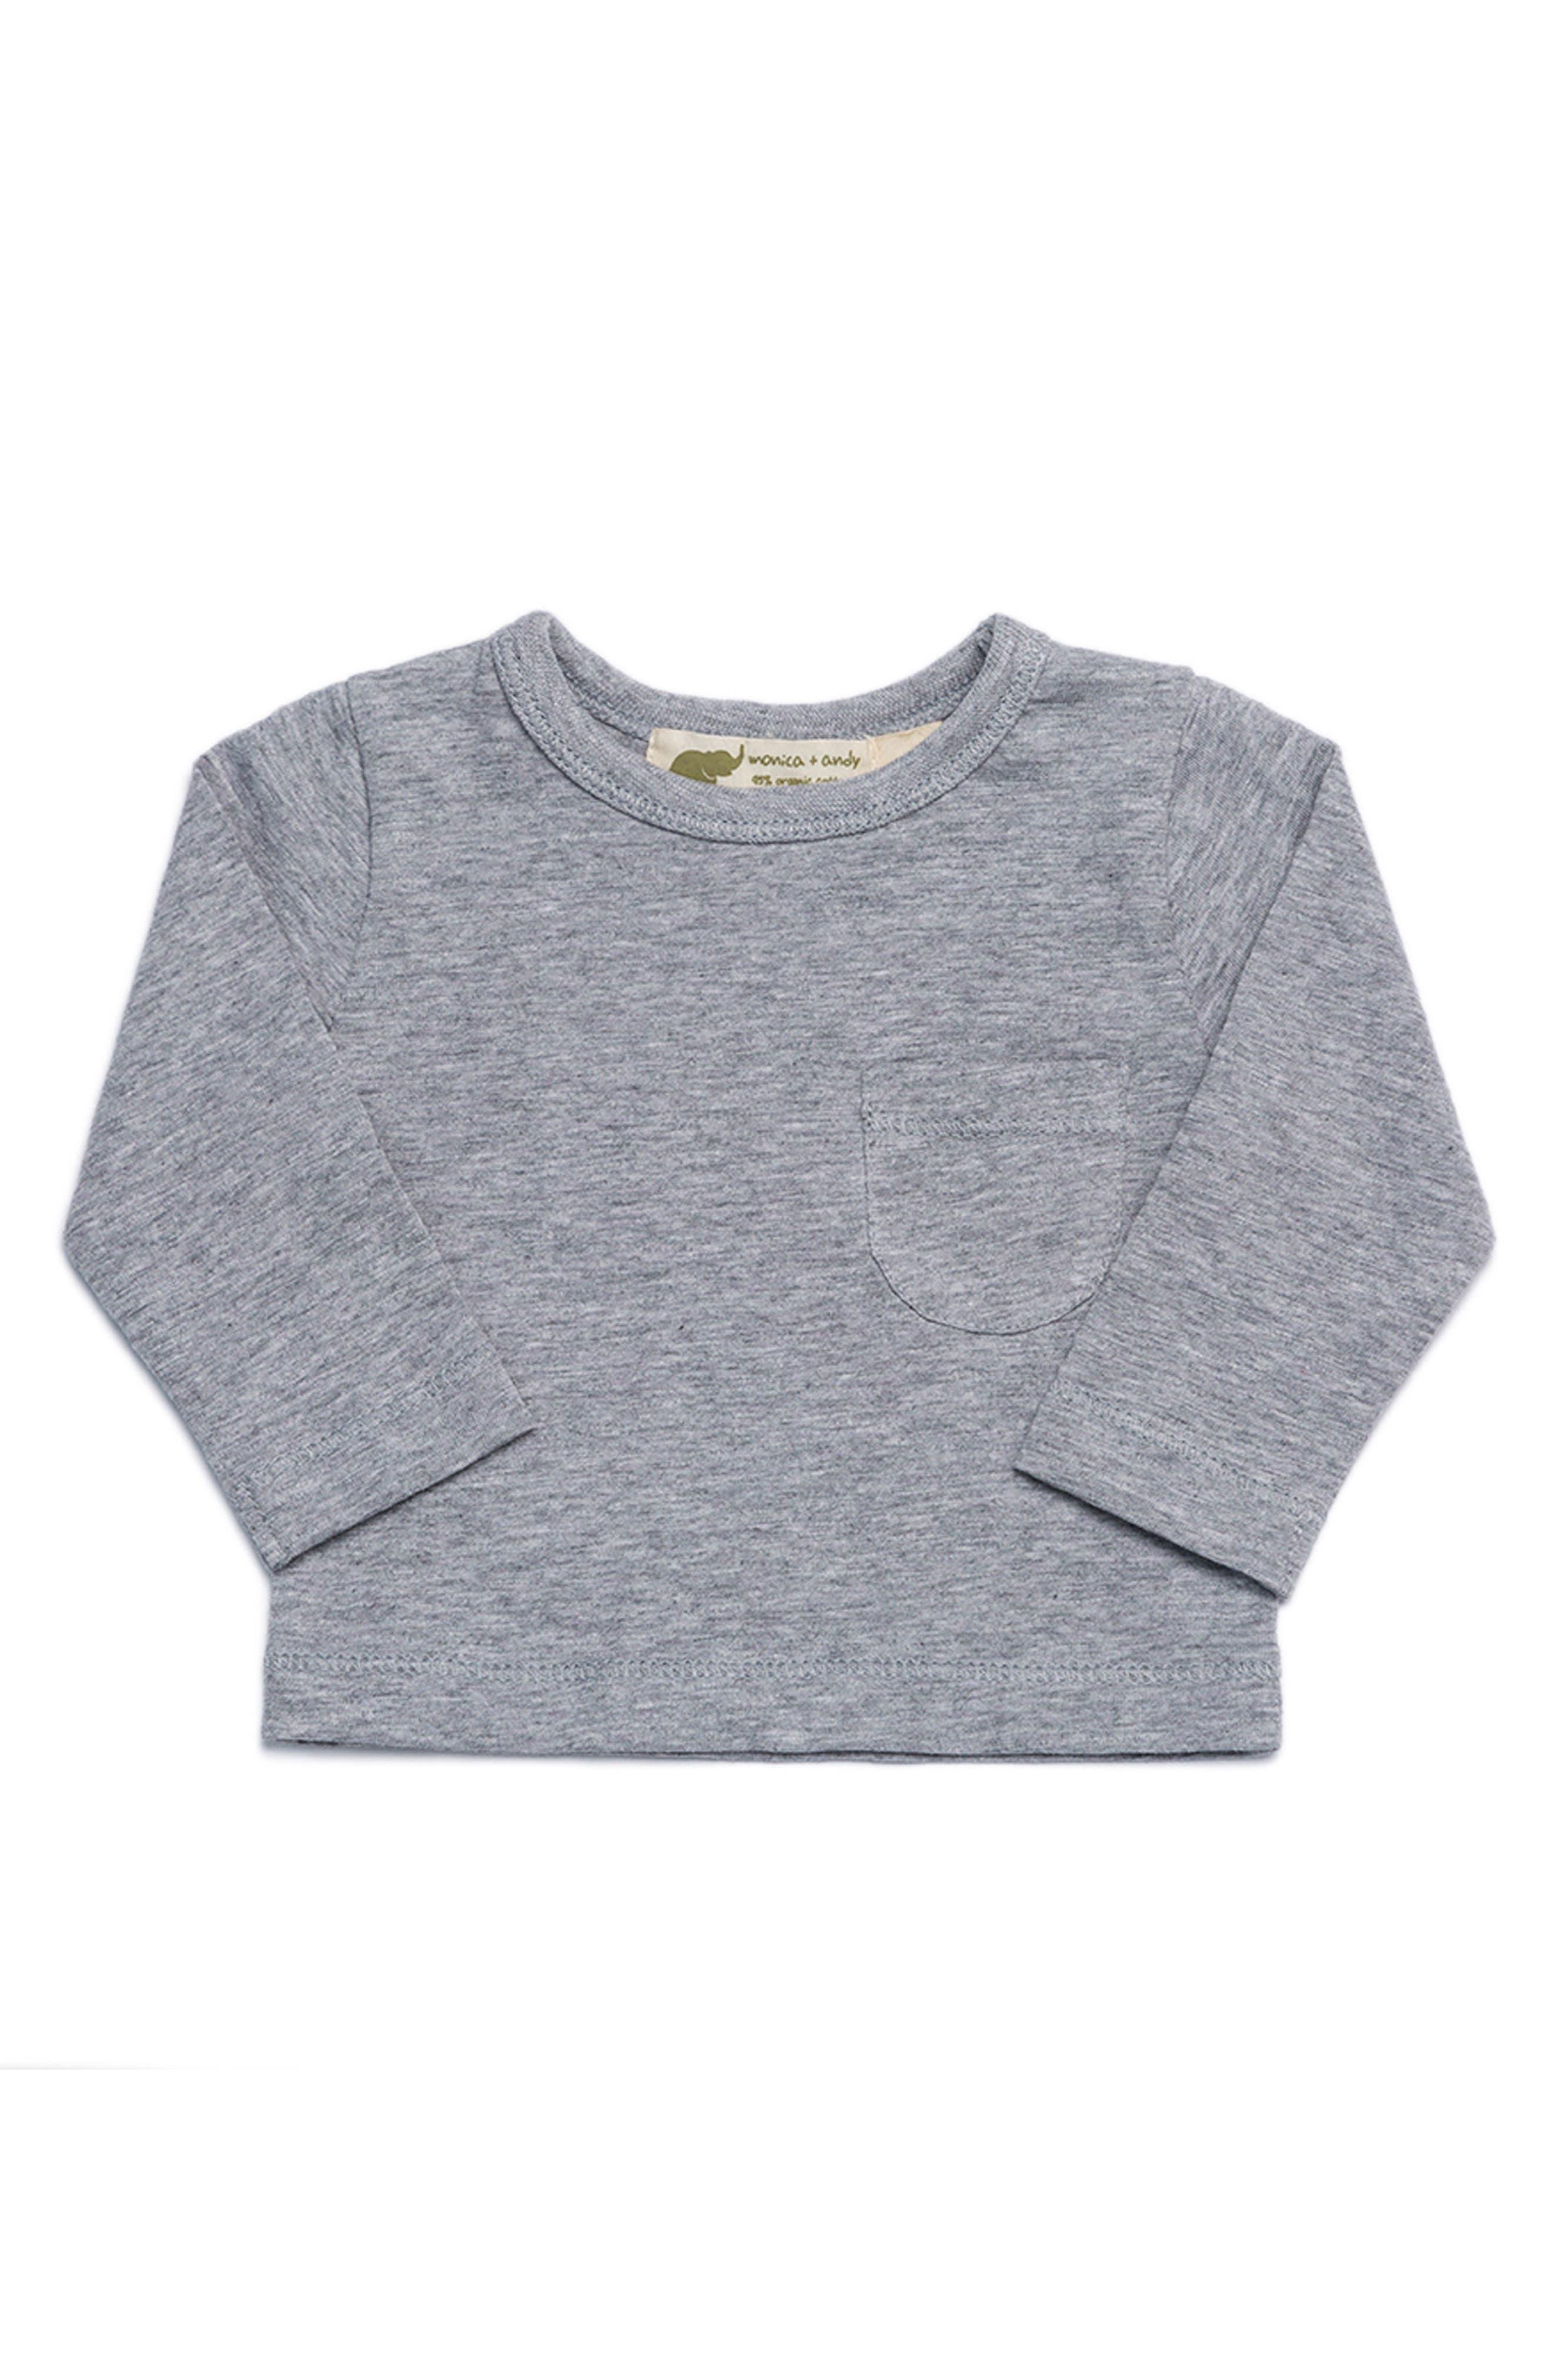 Main Image - Monica + Andy Organic Cotton Pocket T-Shirt (Baby)